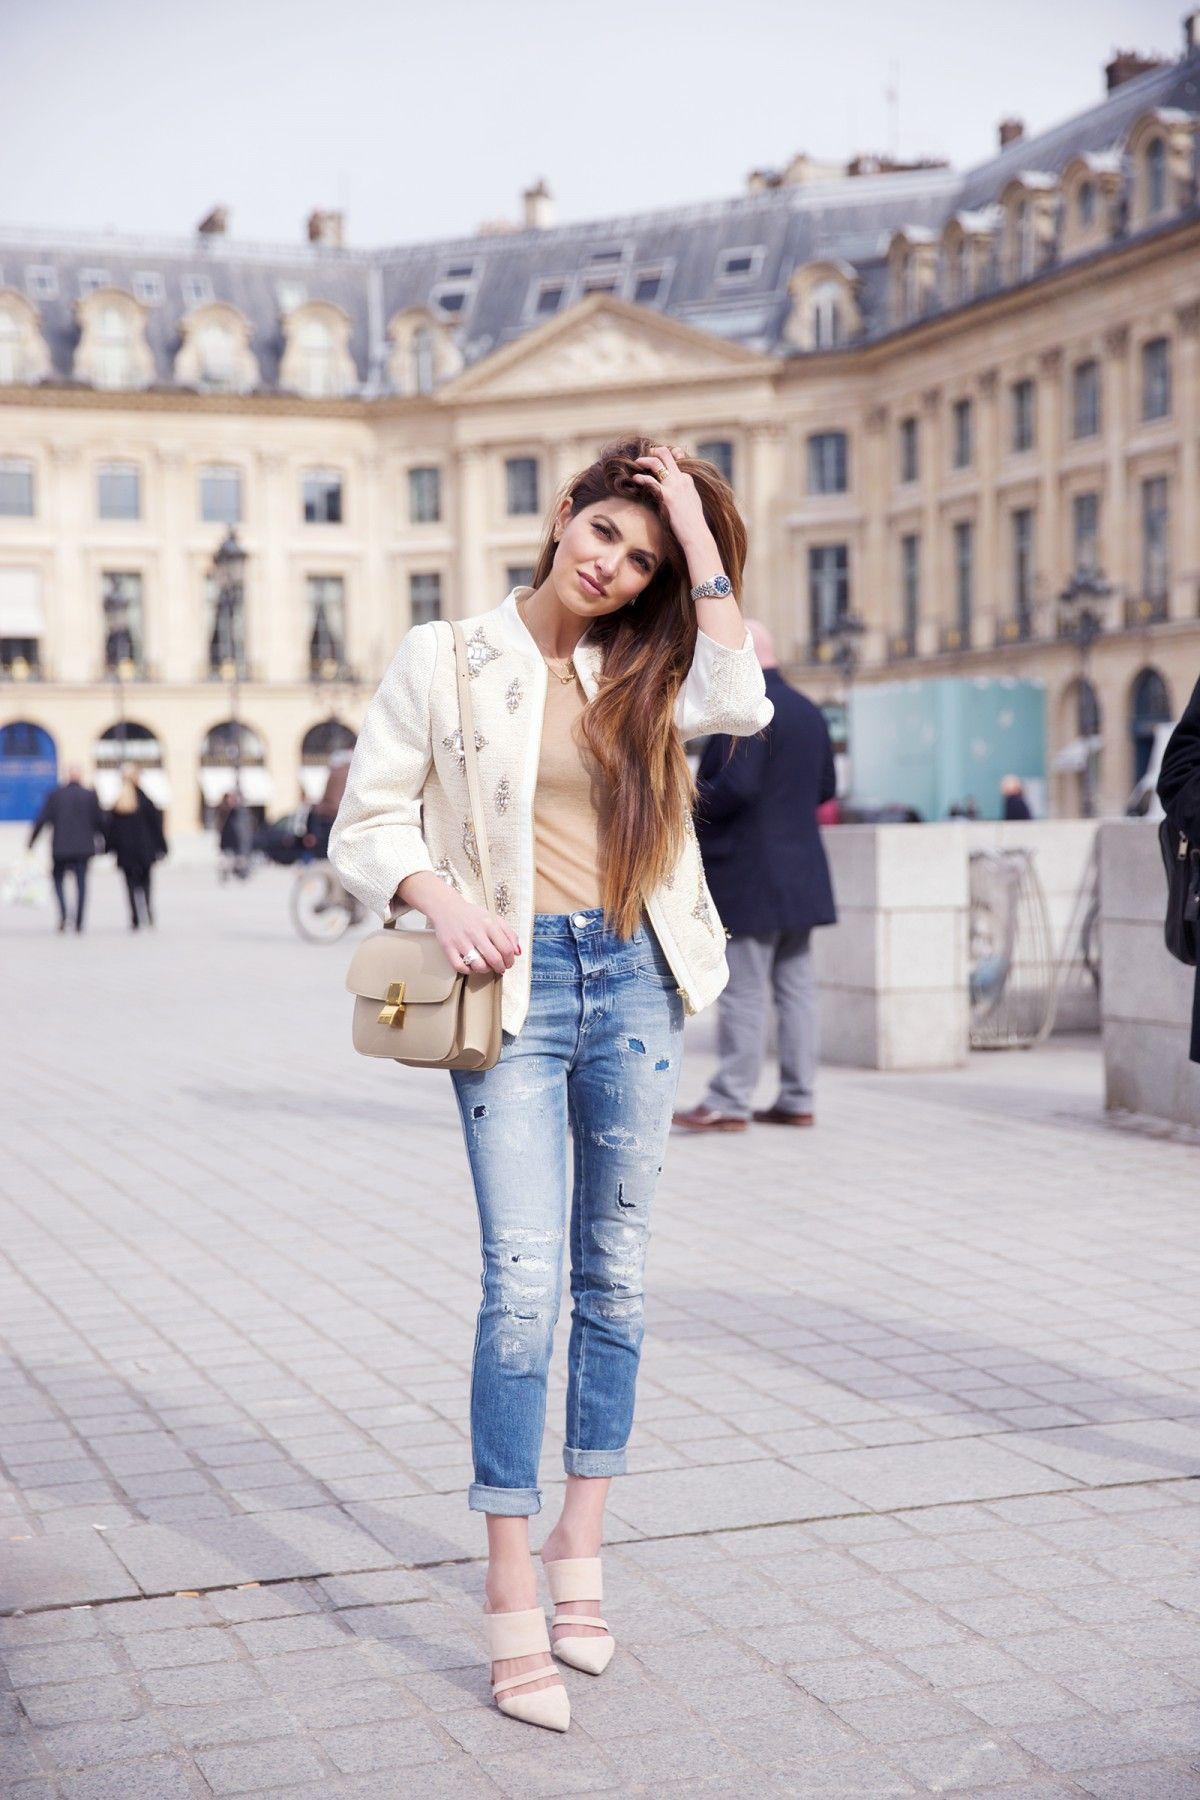 justthedesign: Negin Mirsalehi is wearing a... Fashion Tumblr   Street Wear,